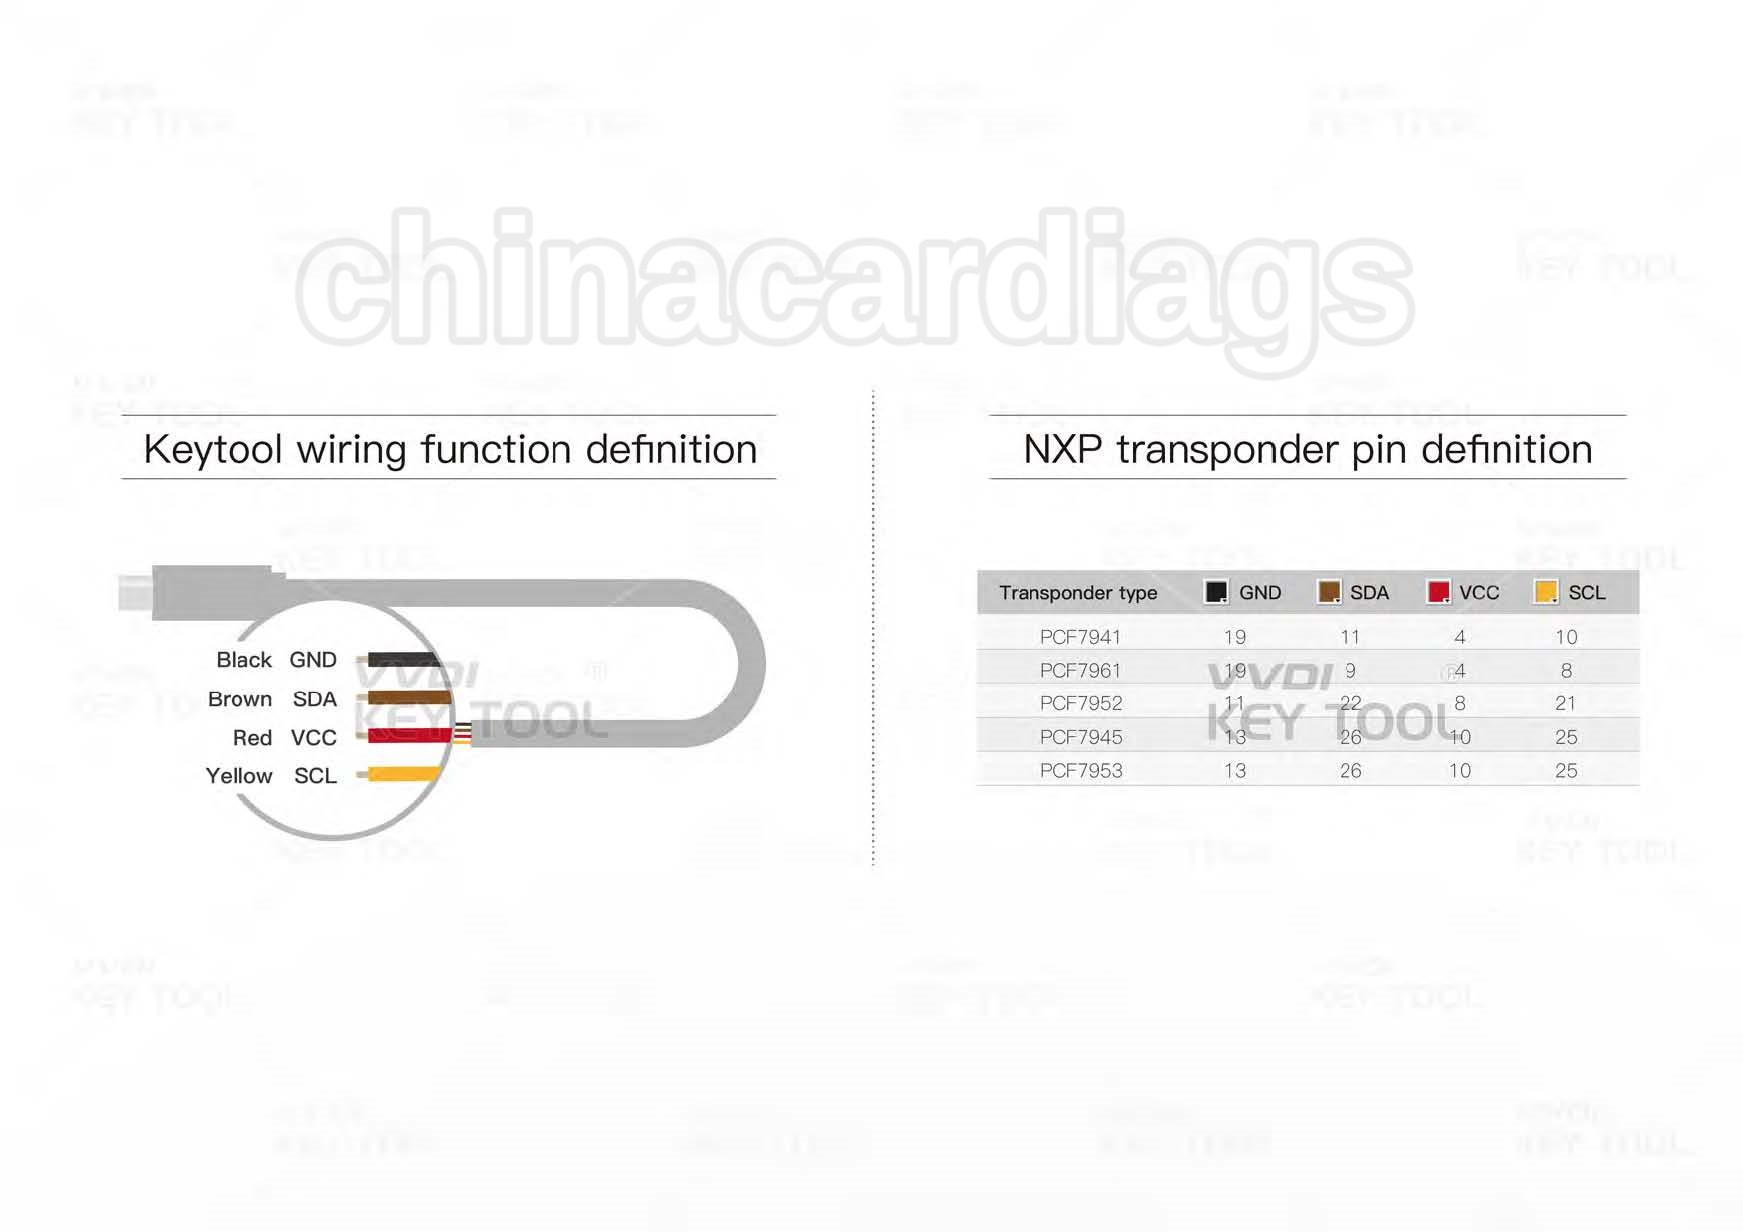 vvdi-key-tool-renew-diagram-01